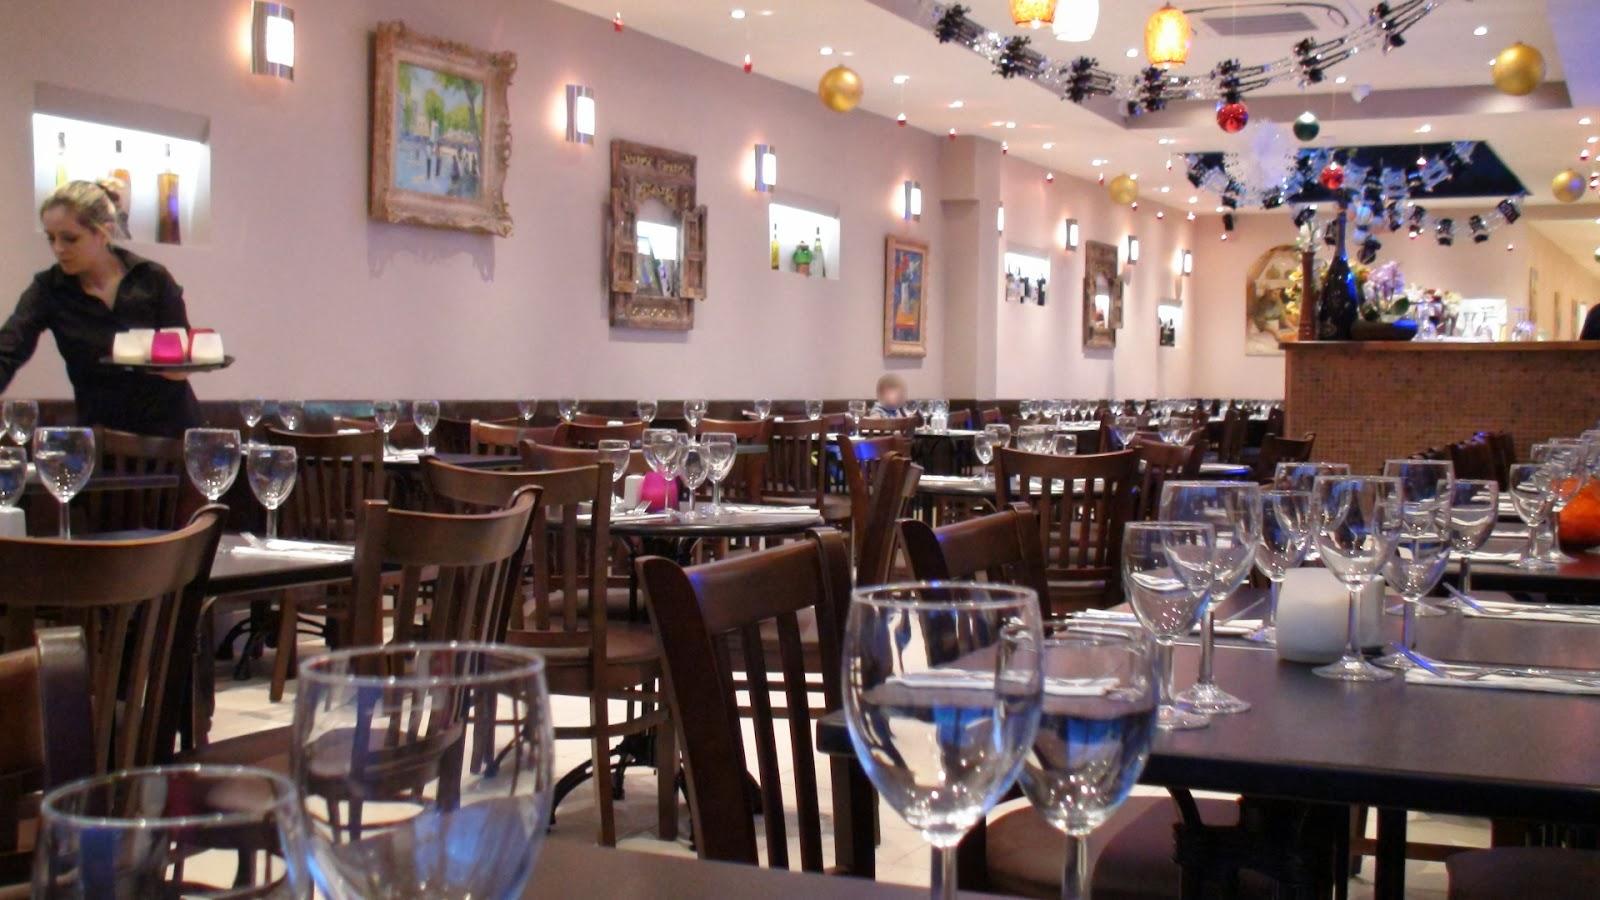 Breakfast Cafes In Worcester